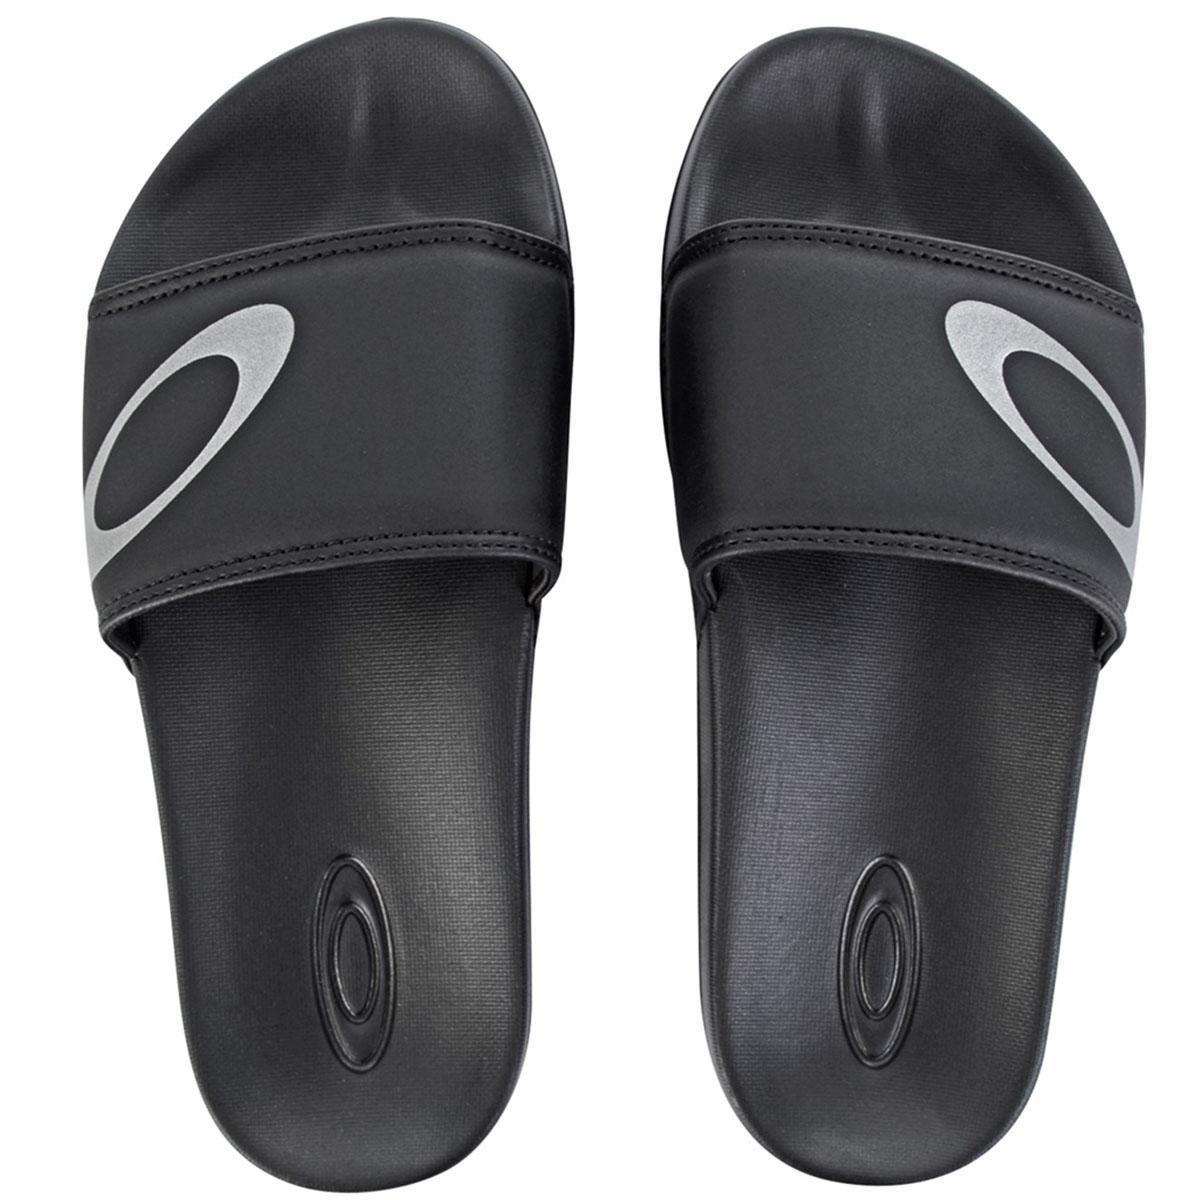 fd77ac049be1b Chinelo Oakley Malibu Slide Masculino - Compre Agora